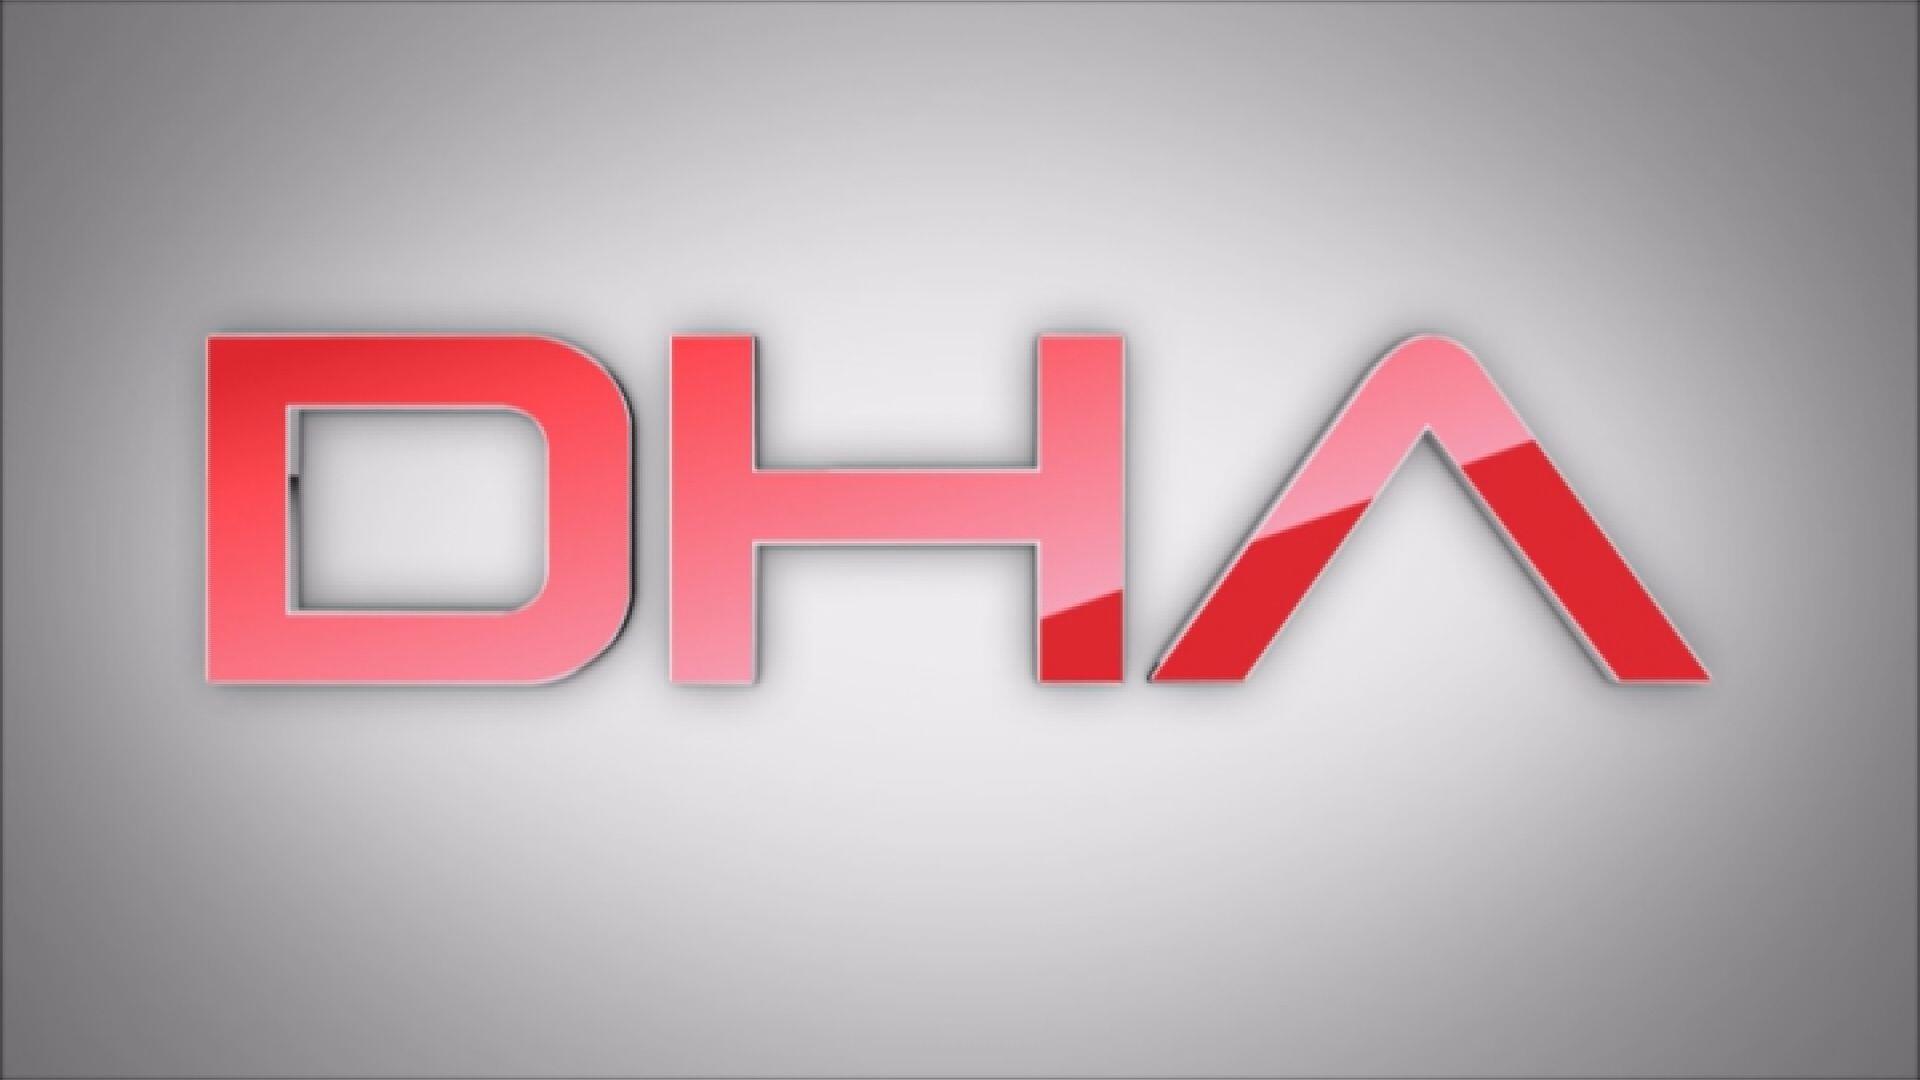 DHA%E2%80%99dan,+Medyakoridoru%E2%80%99na+a%C3%A7%C4%B1klama%21;